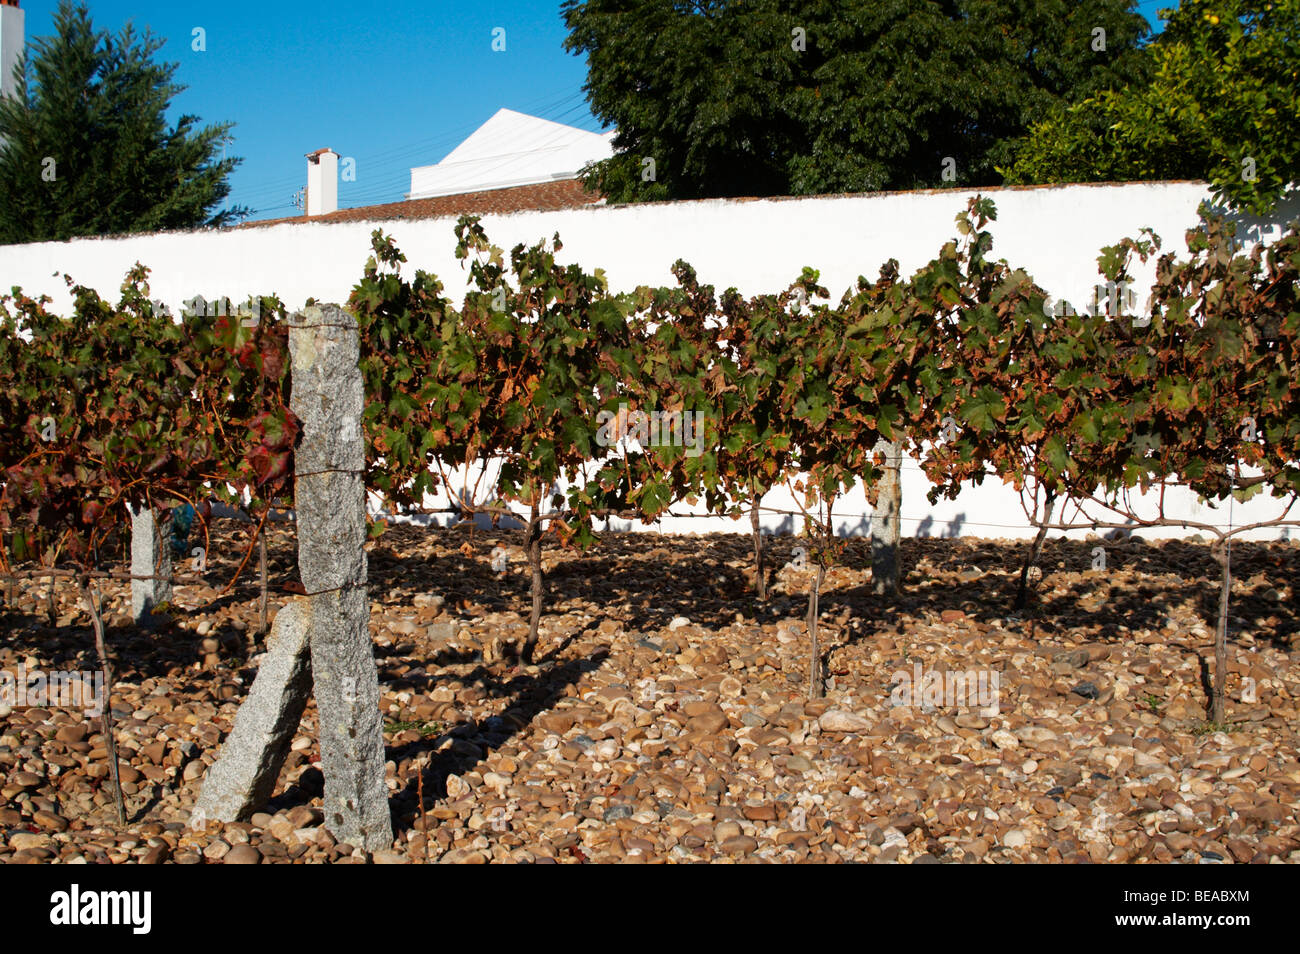 adega jose de sousa rosado fernandes alentejo portugal - Stock Image